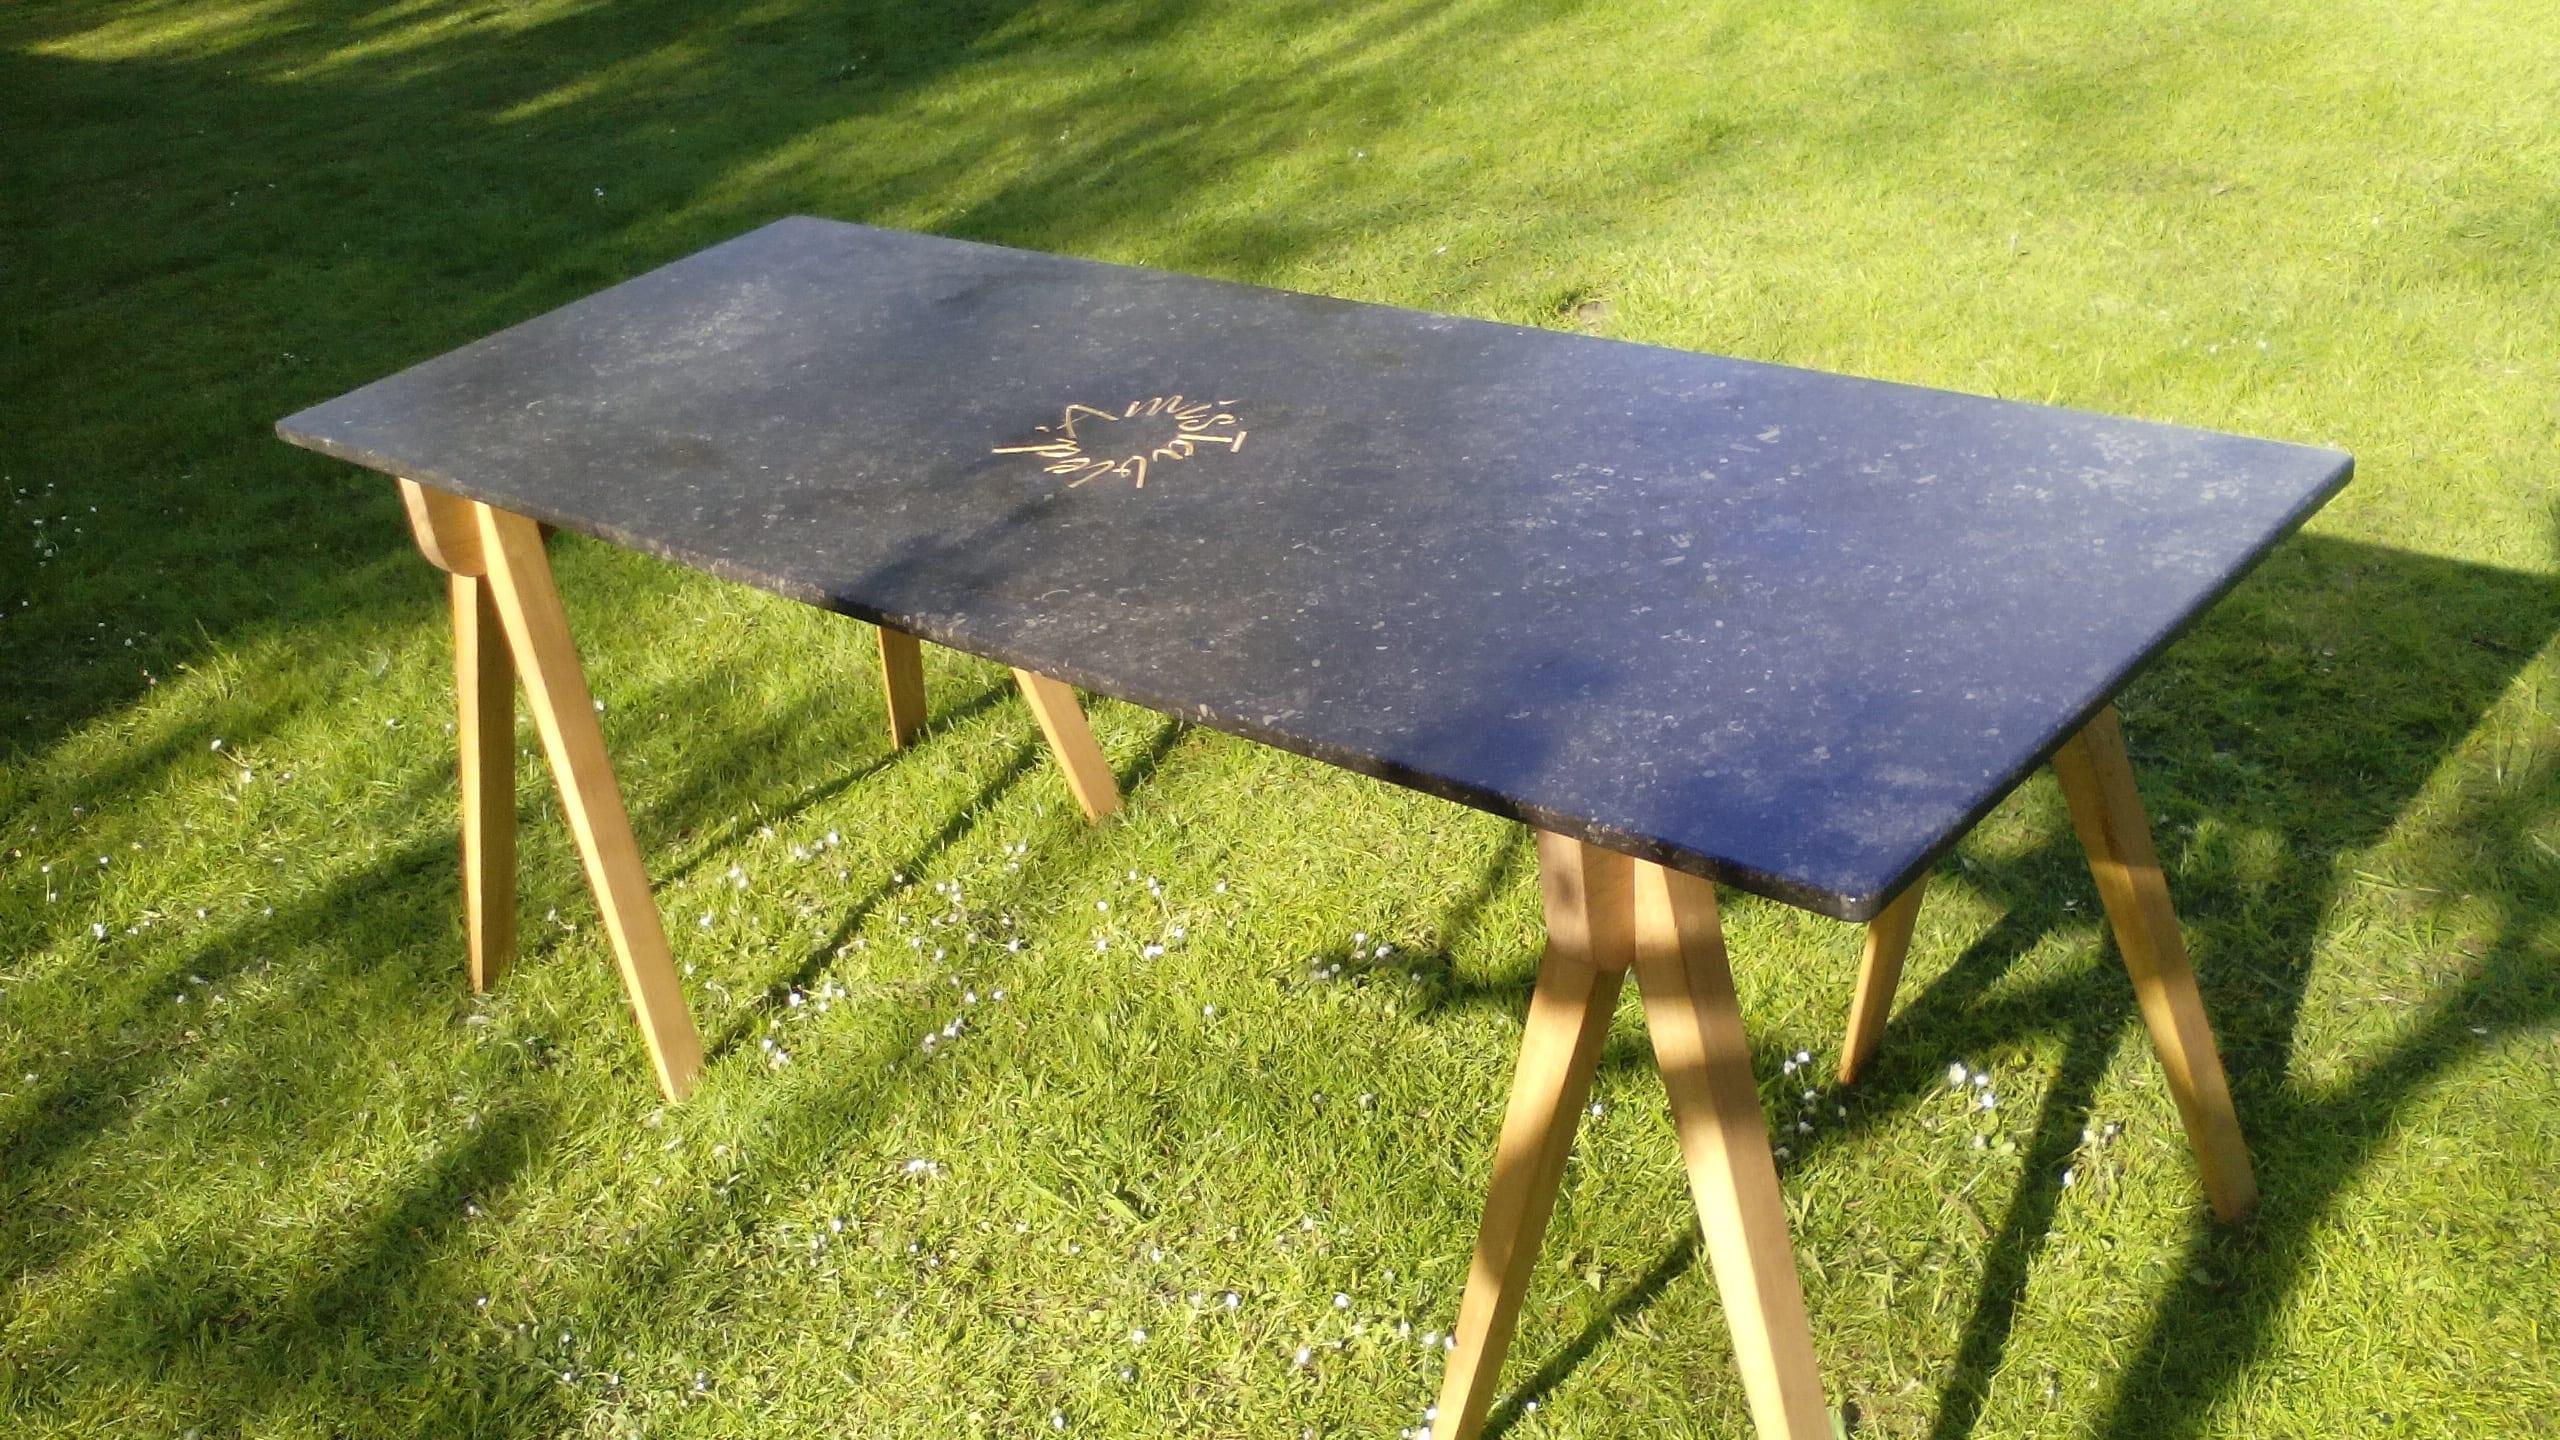 teksttafel Table d'Amis, letters in natuursteen, bladgoud